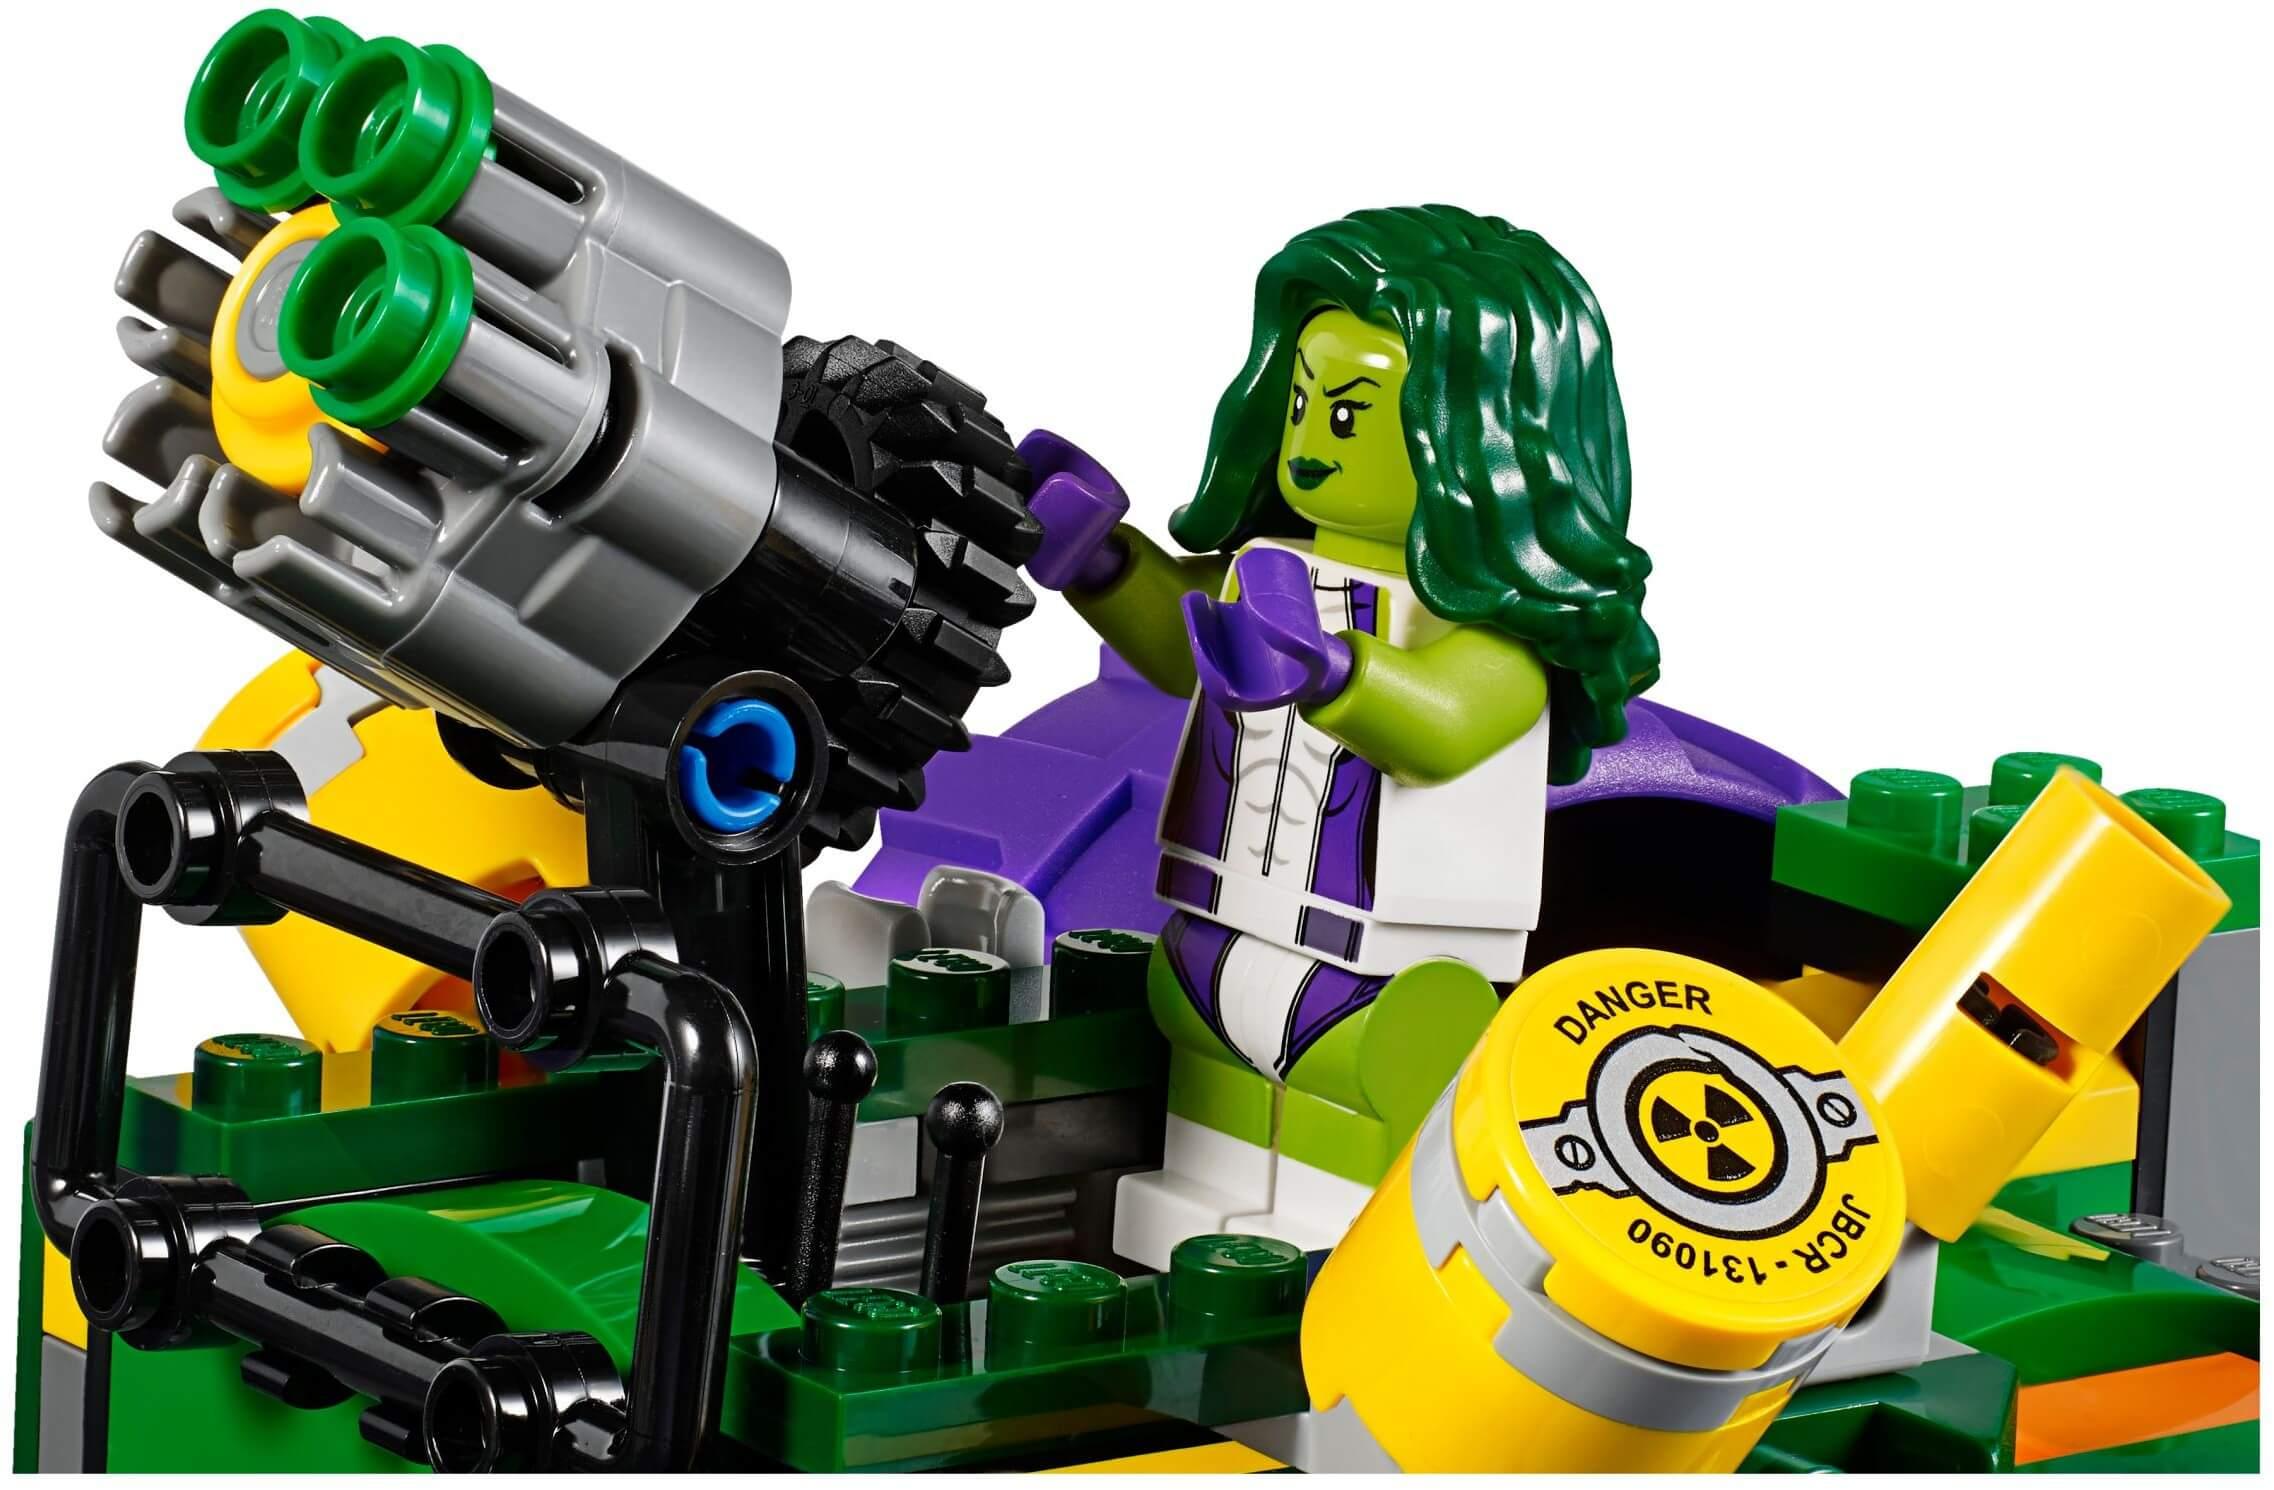 Mua đồ chơi LEGO 76078 - LEGO 76078 - Hulk đại chiến Hulk Đỏ (LEGO Marvel Super Heroes Hulk Vs. Red Hulk)